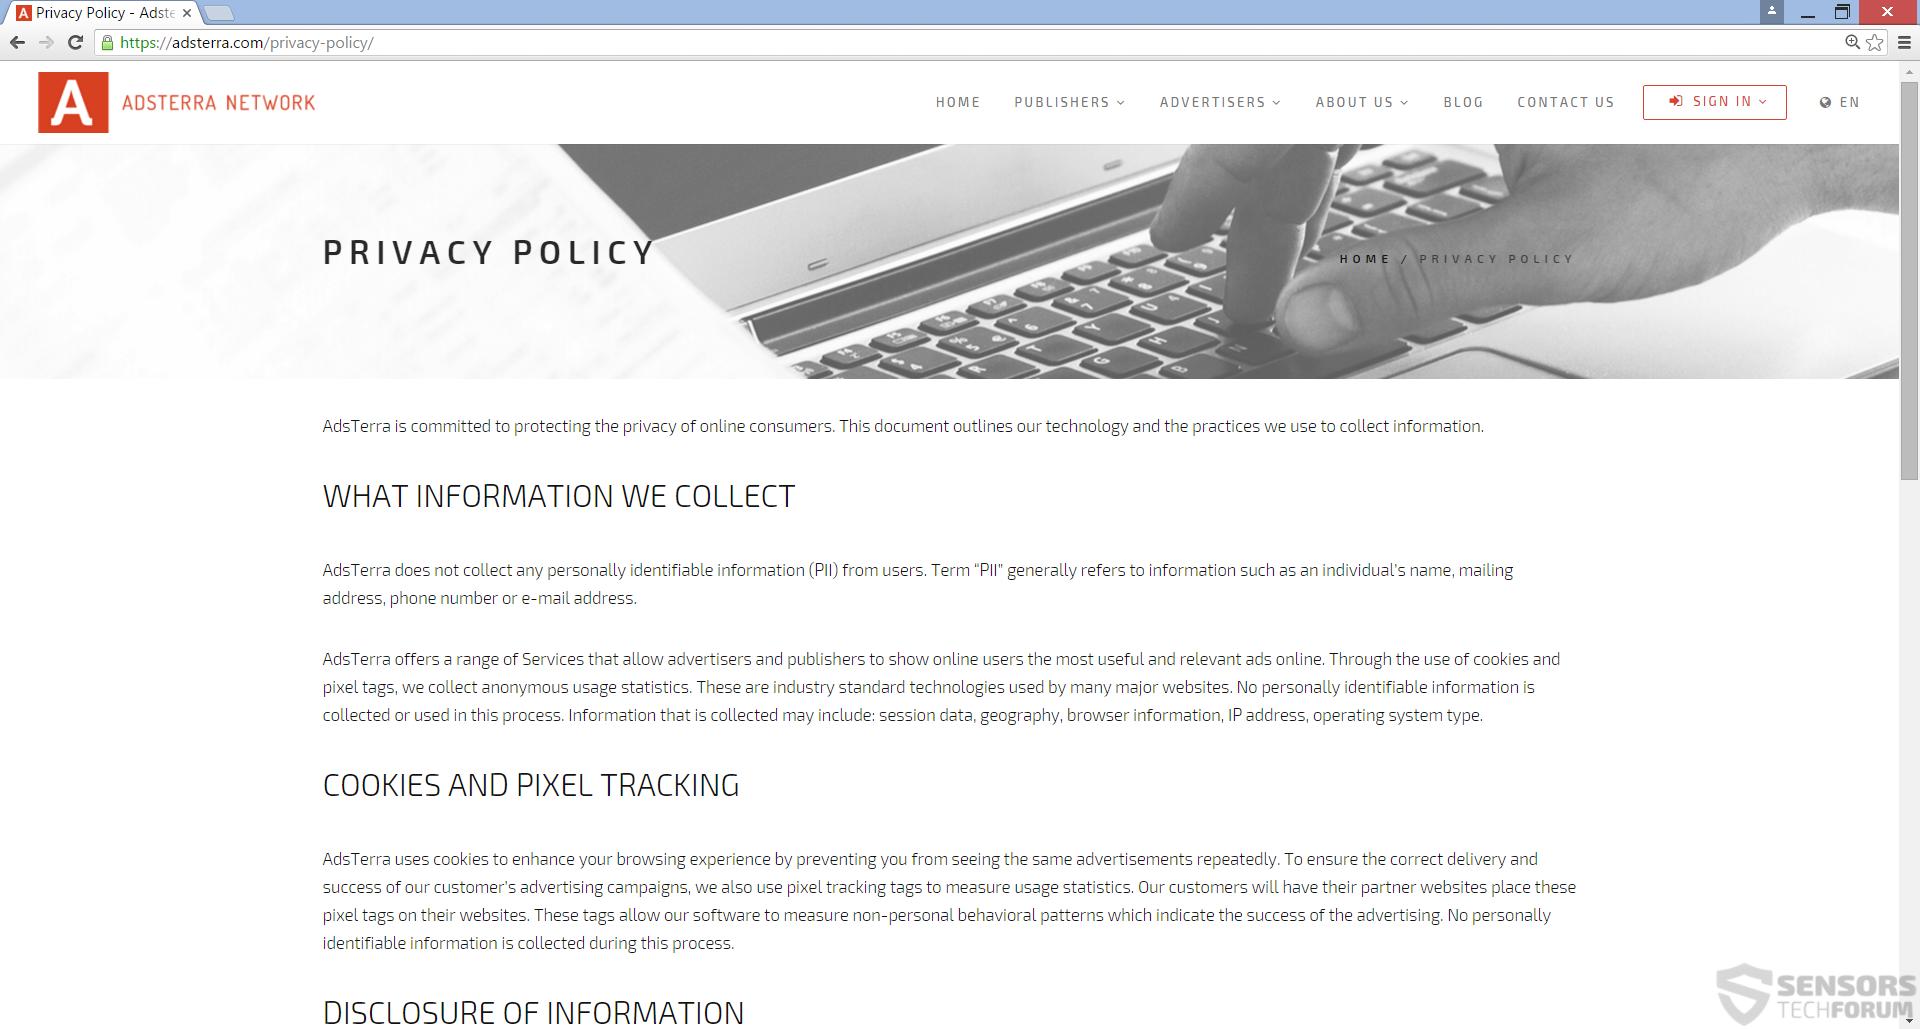 STF-aew9eigieng-info-adsterra-network-privacy-policy